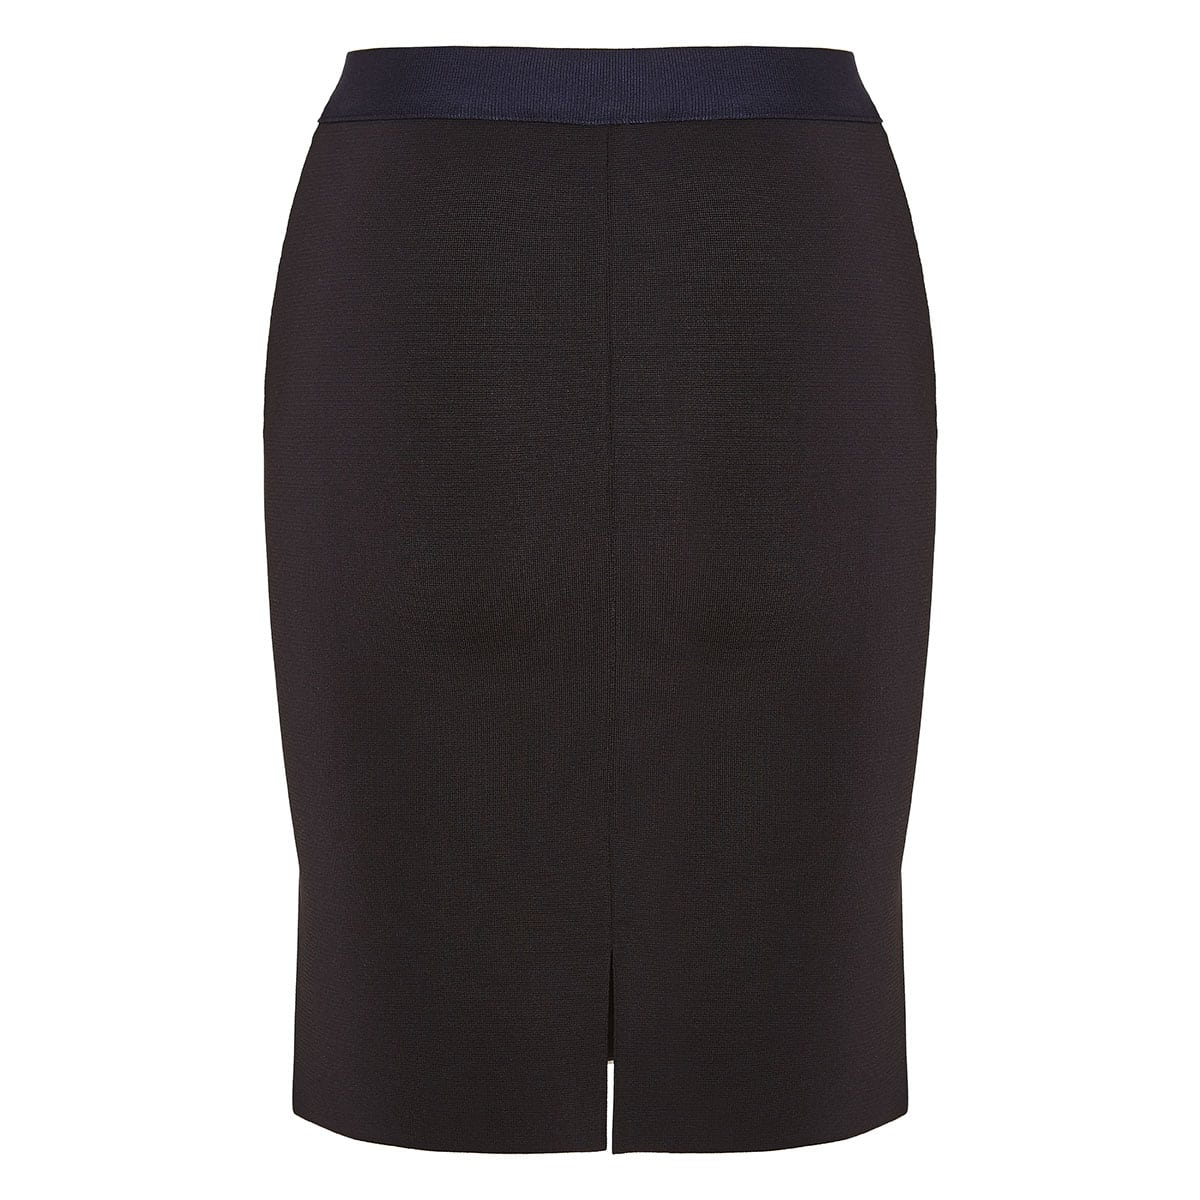 Two-tone fitted zipper mini skirt